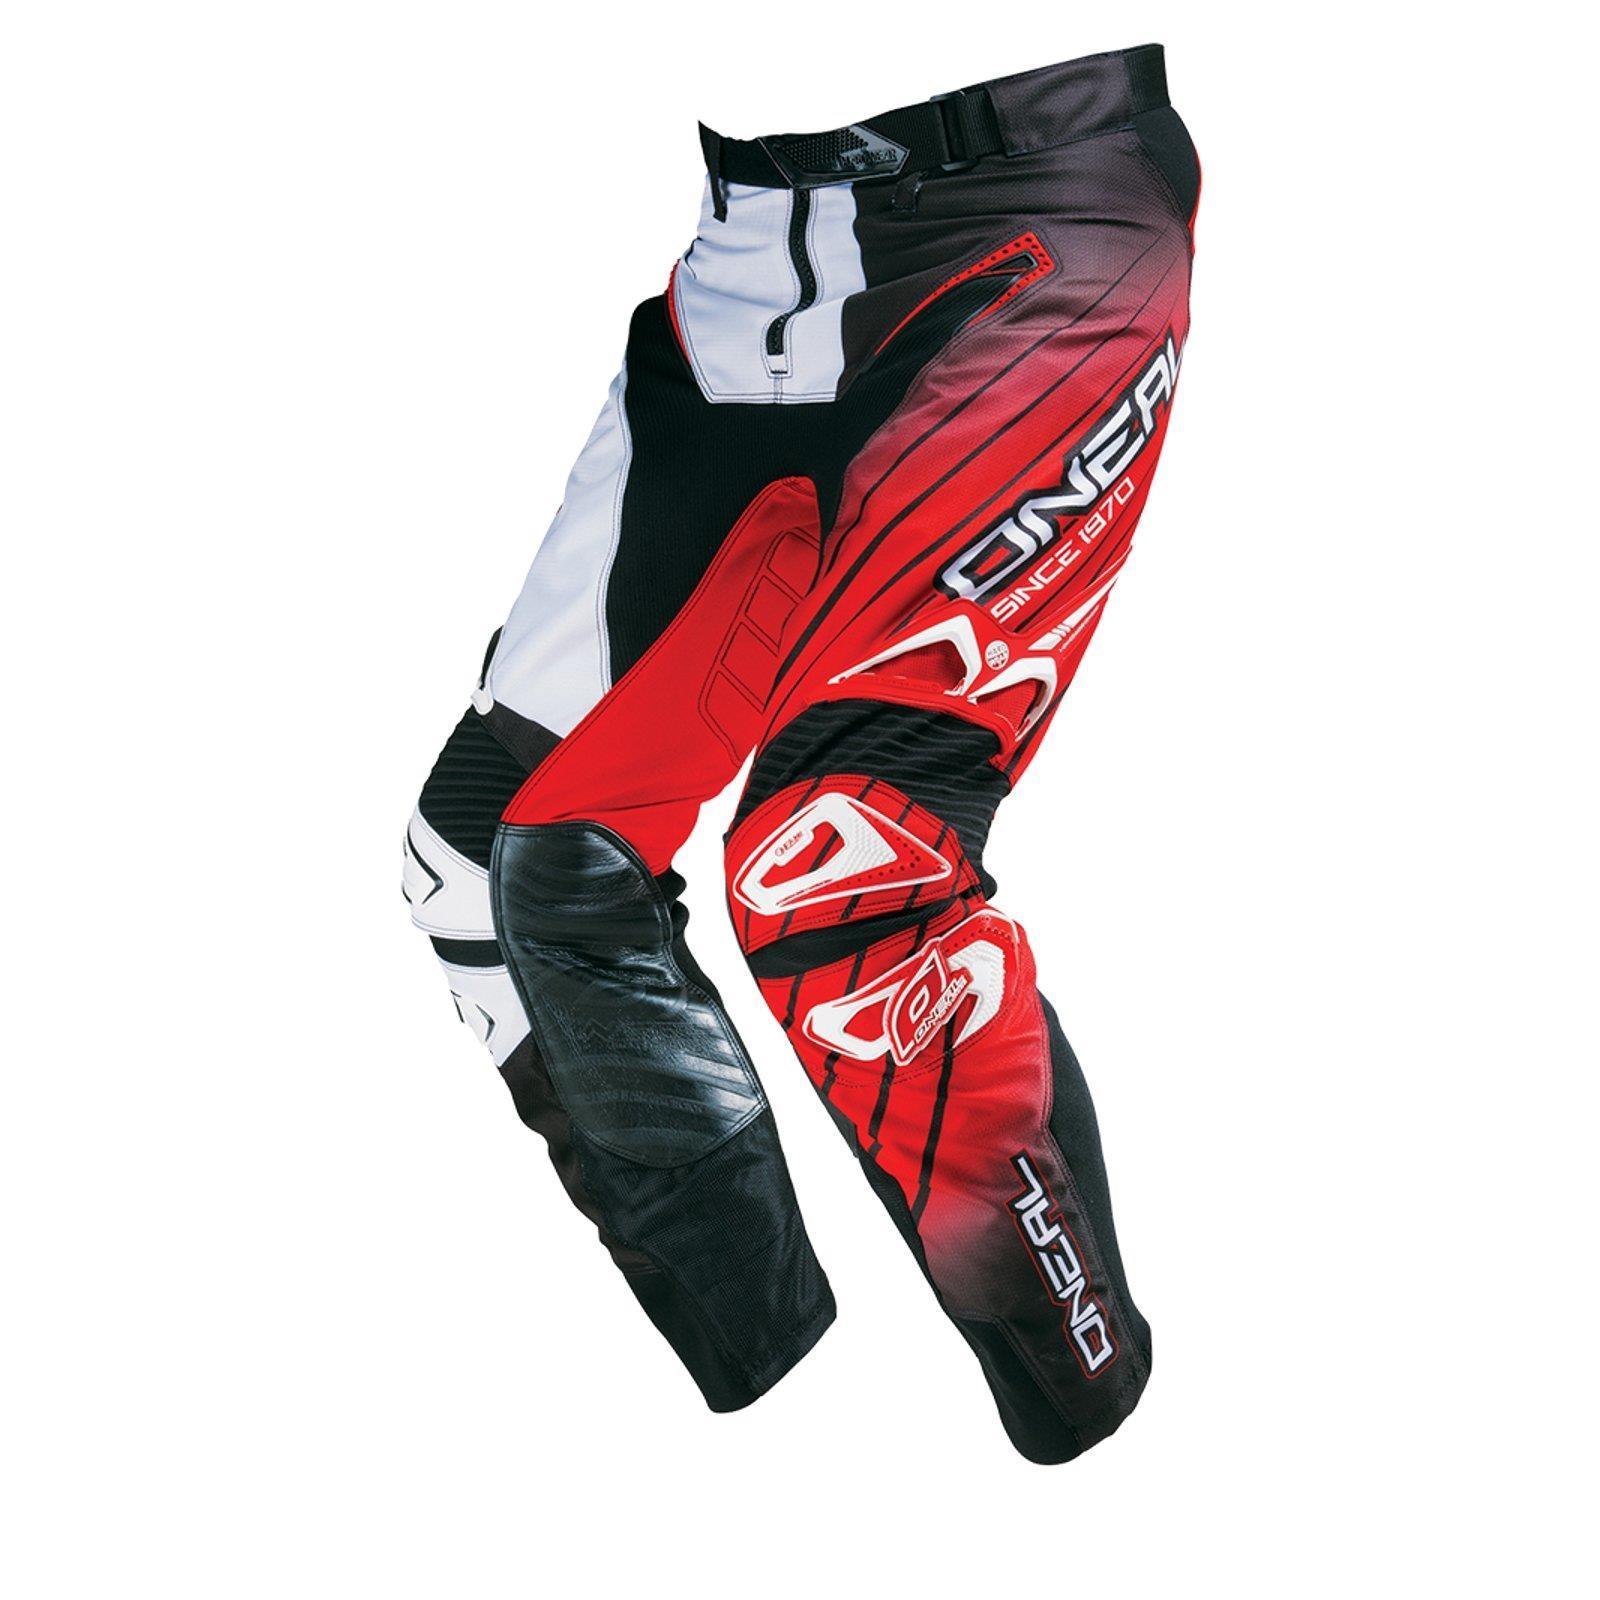 O-039-neal-elemento-Mayhem-Hardwear-Pants-pantalones-MX-Moto-Cross-Enduro-todoterreno-cuero miniatura 31